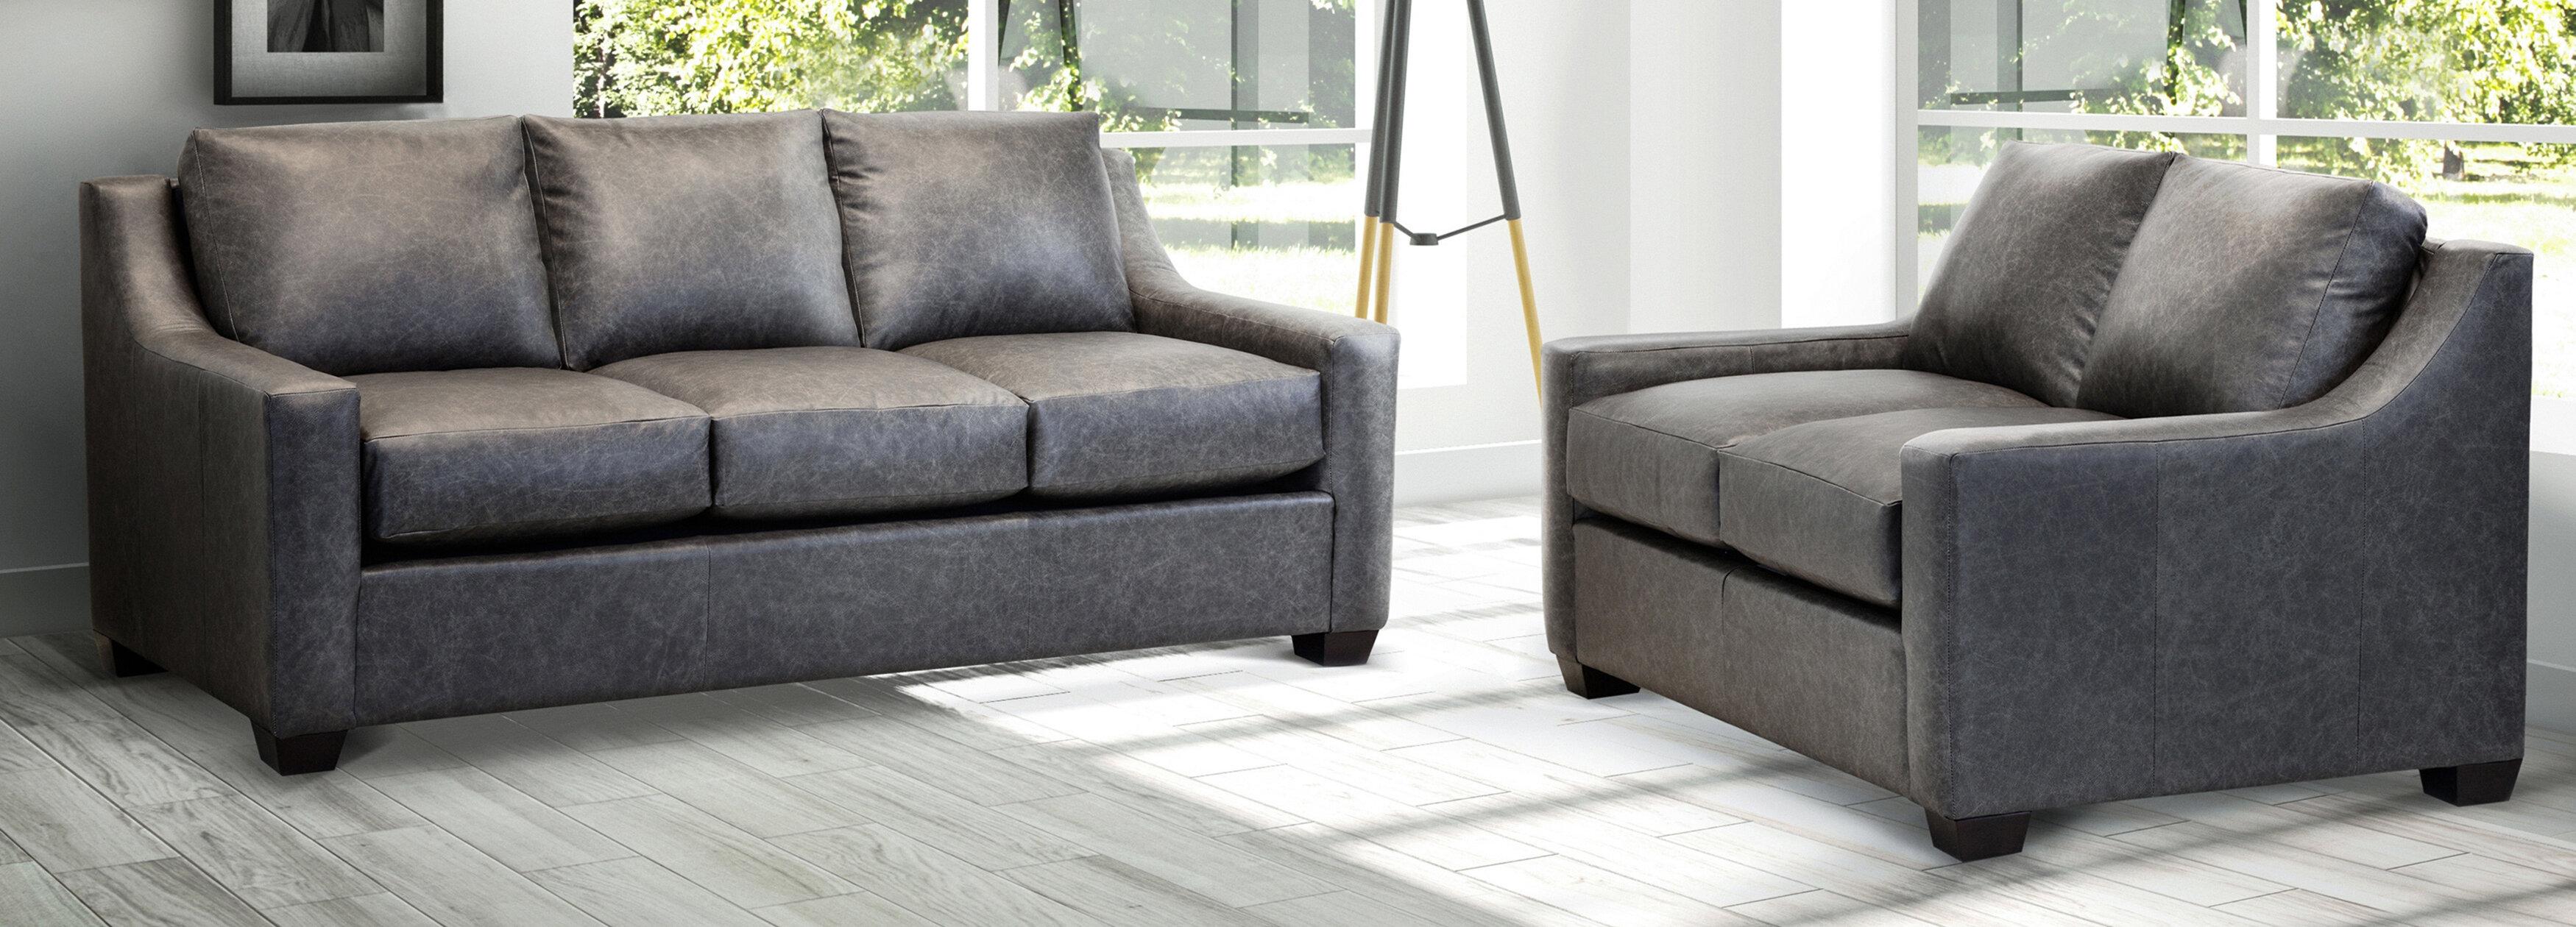 Ebern Designs Made In Usa Rosmunda Distressed Grey Top Grain Leather Sofa And Loveseat Wayfair Ca